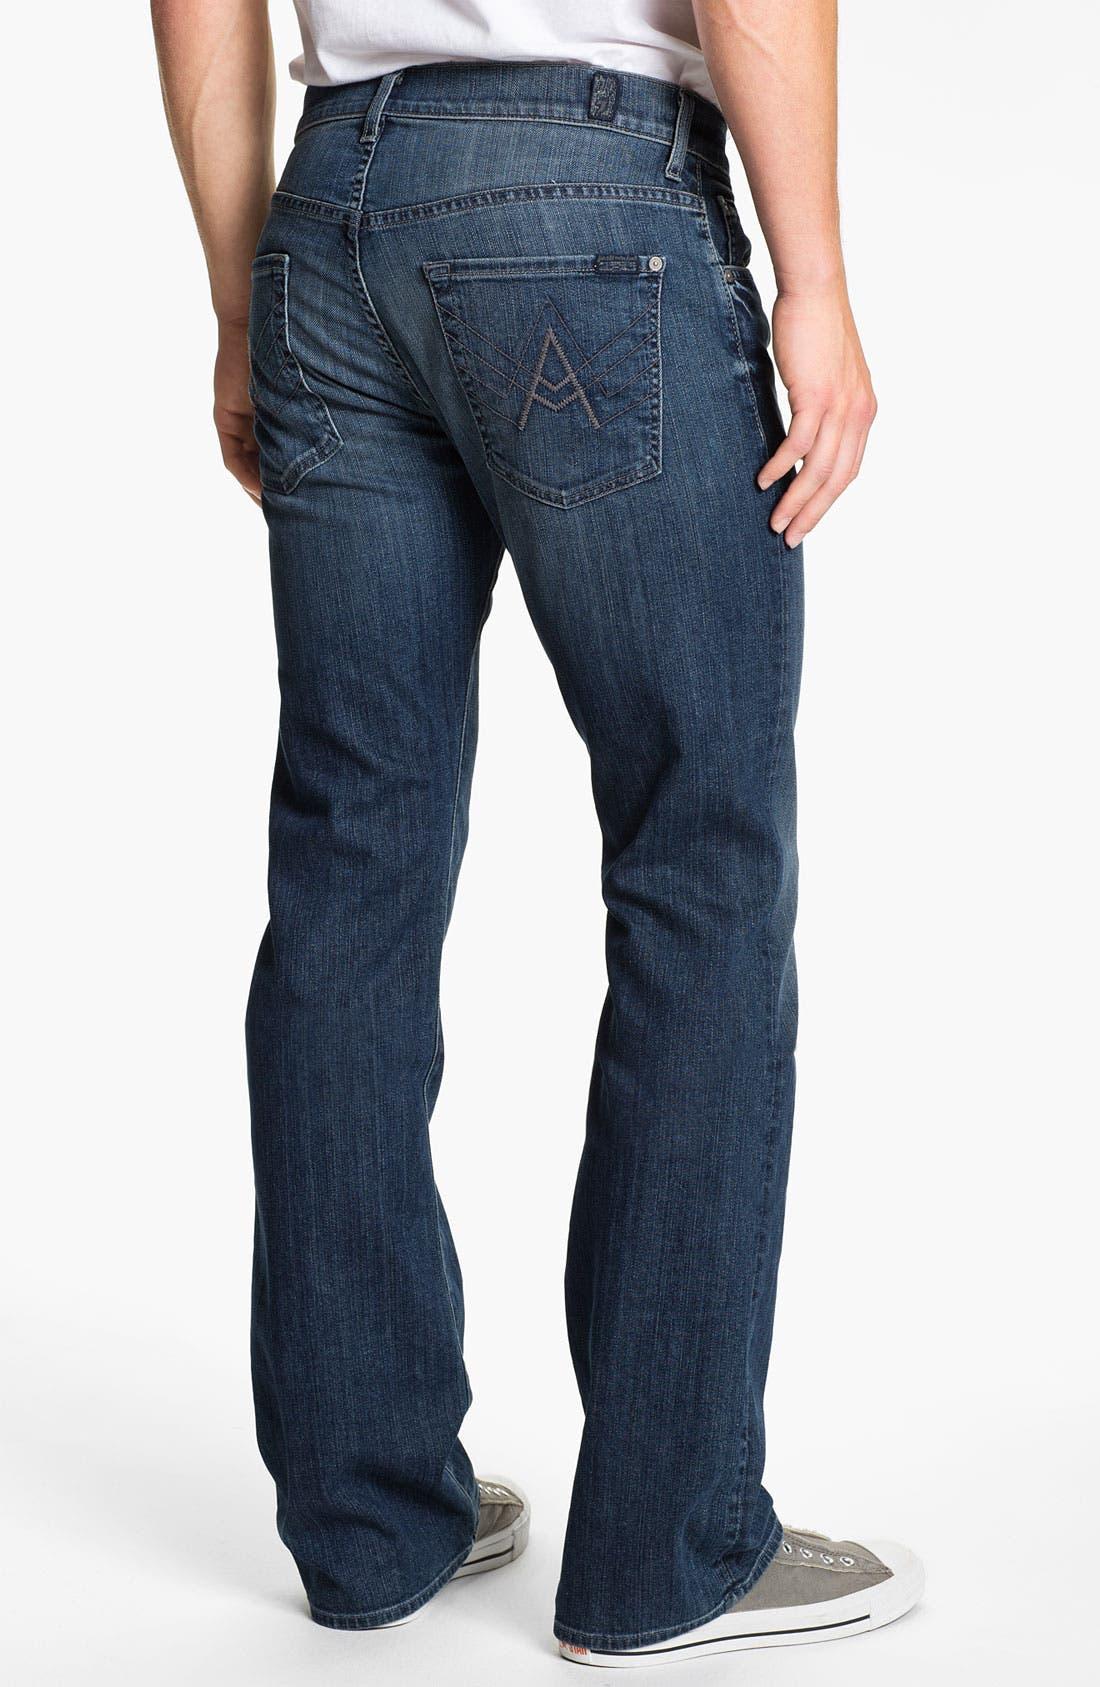 Main Image - 7 For All Mankind® 'Brett' Bootcut Jeans (Nakkita Grey)